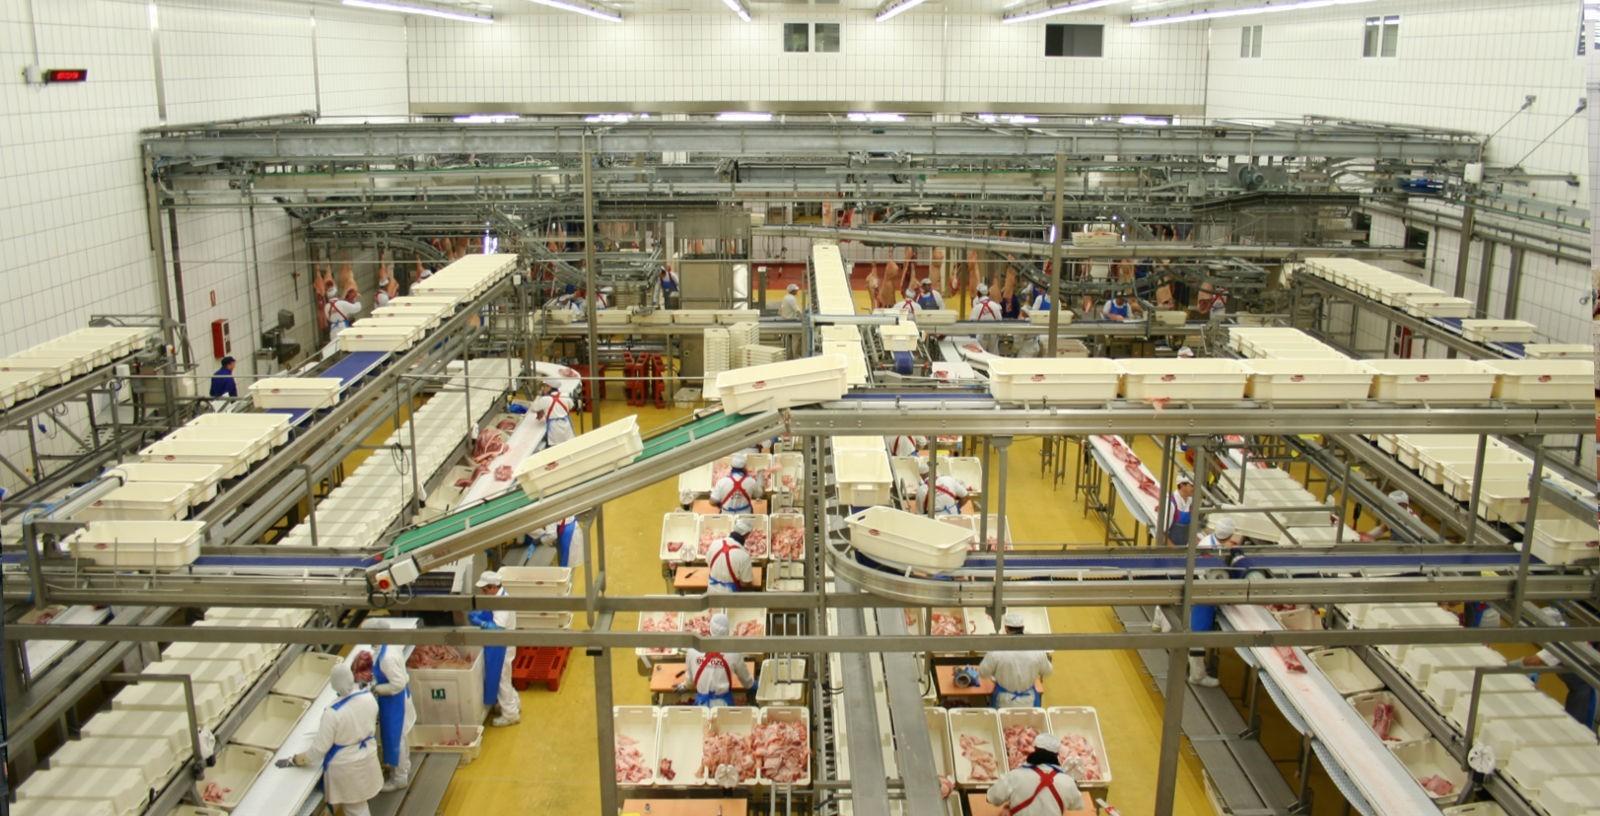 Meat_Manufacturing_Plants_Spain_El_Pozo_IDOM_02